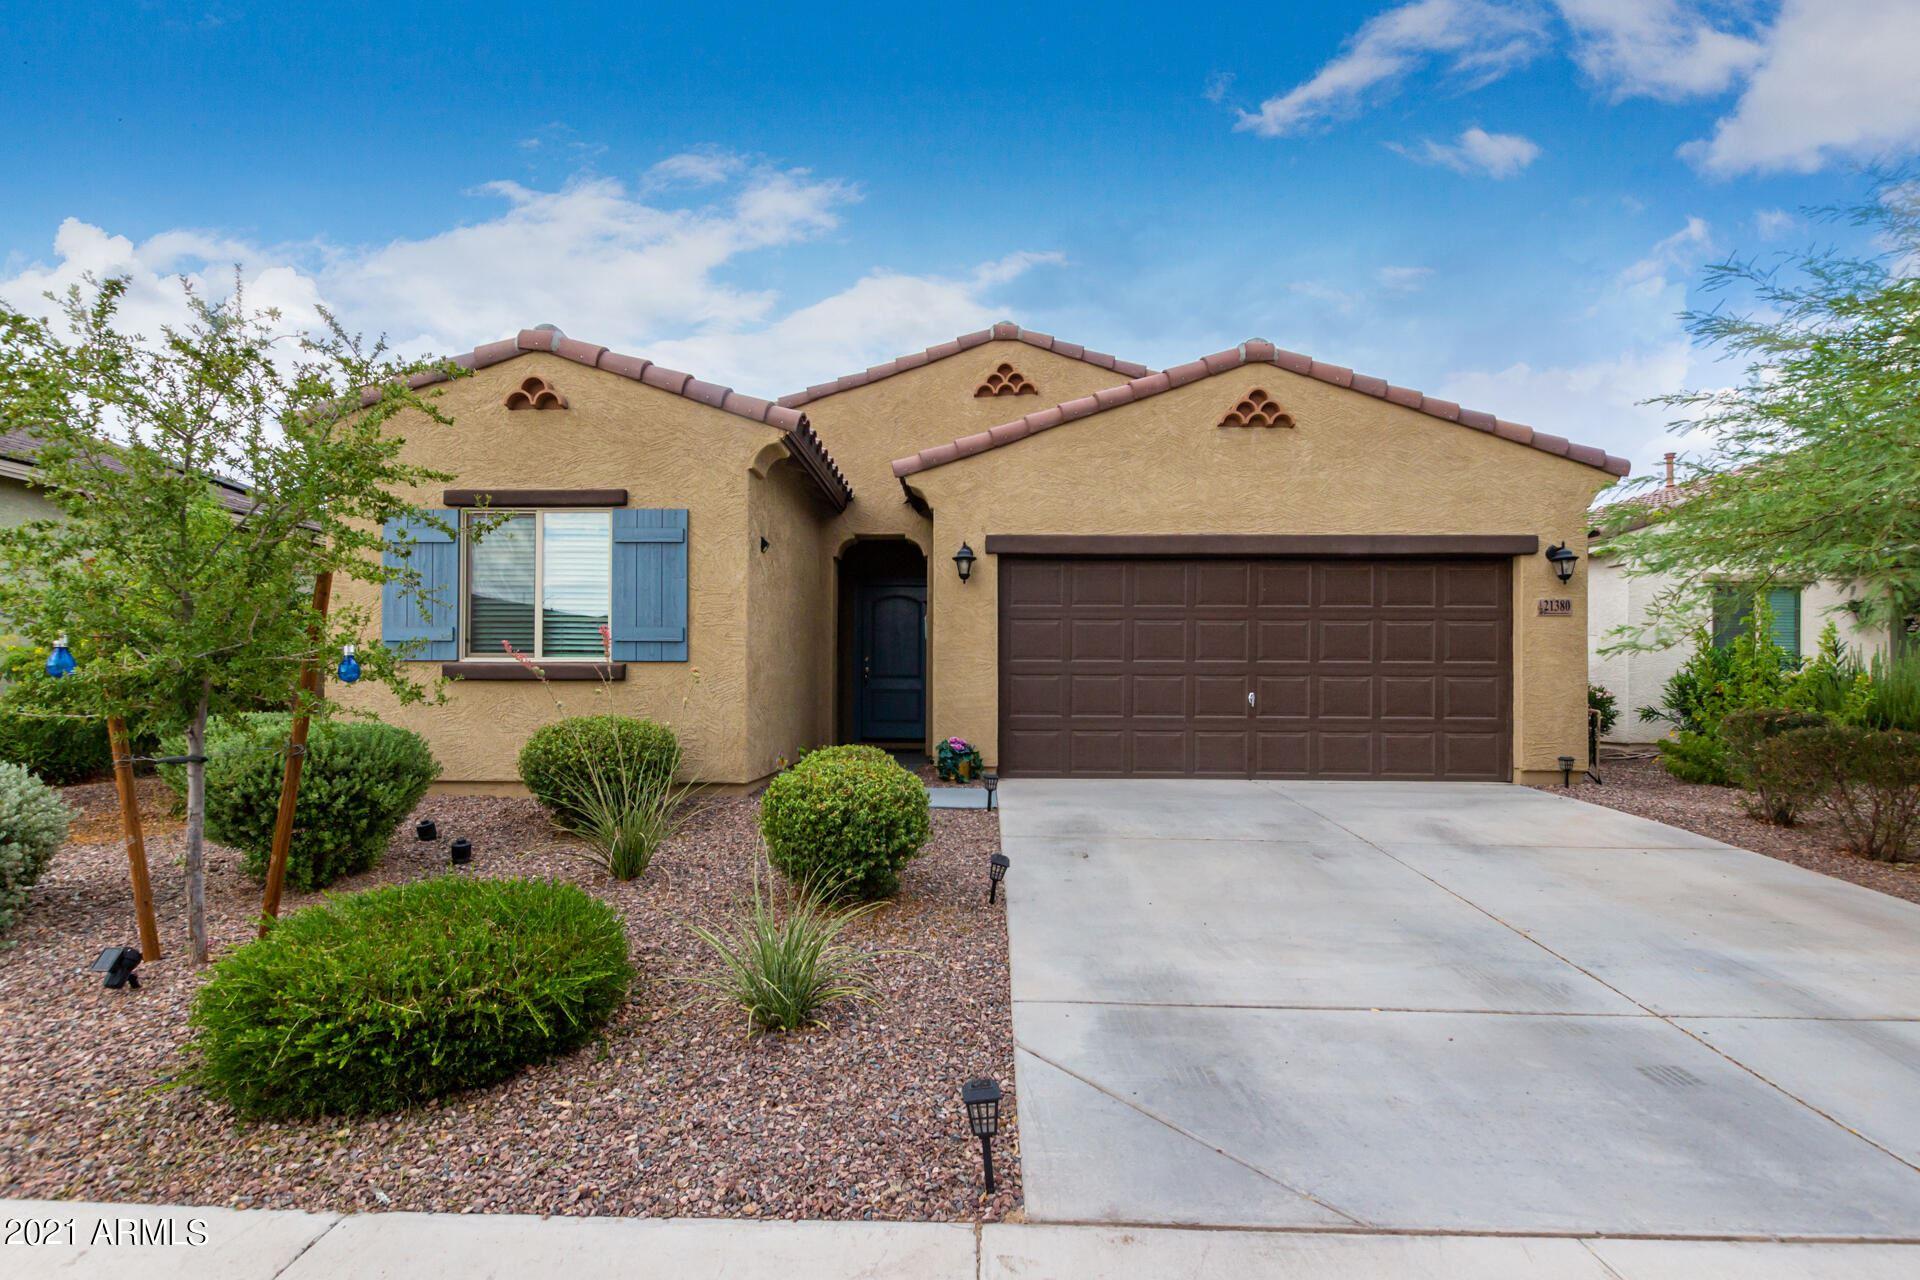 21380 W MONTE VISTA Road, Buckeye, AZ 85396 - MLS#: 6268364